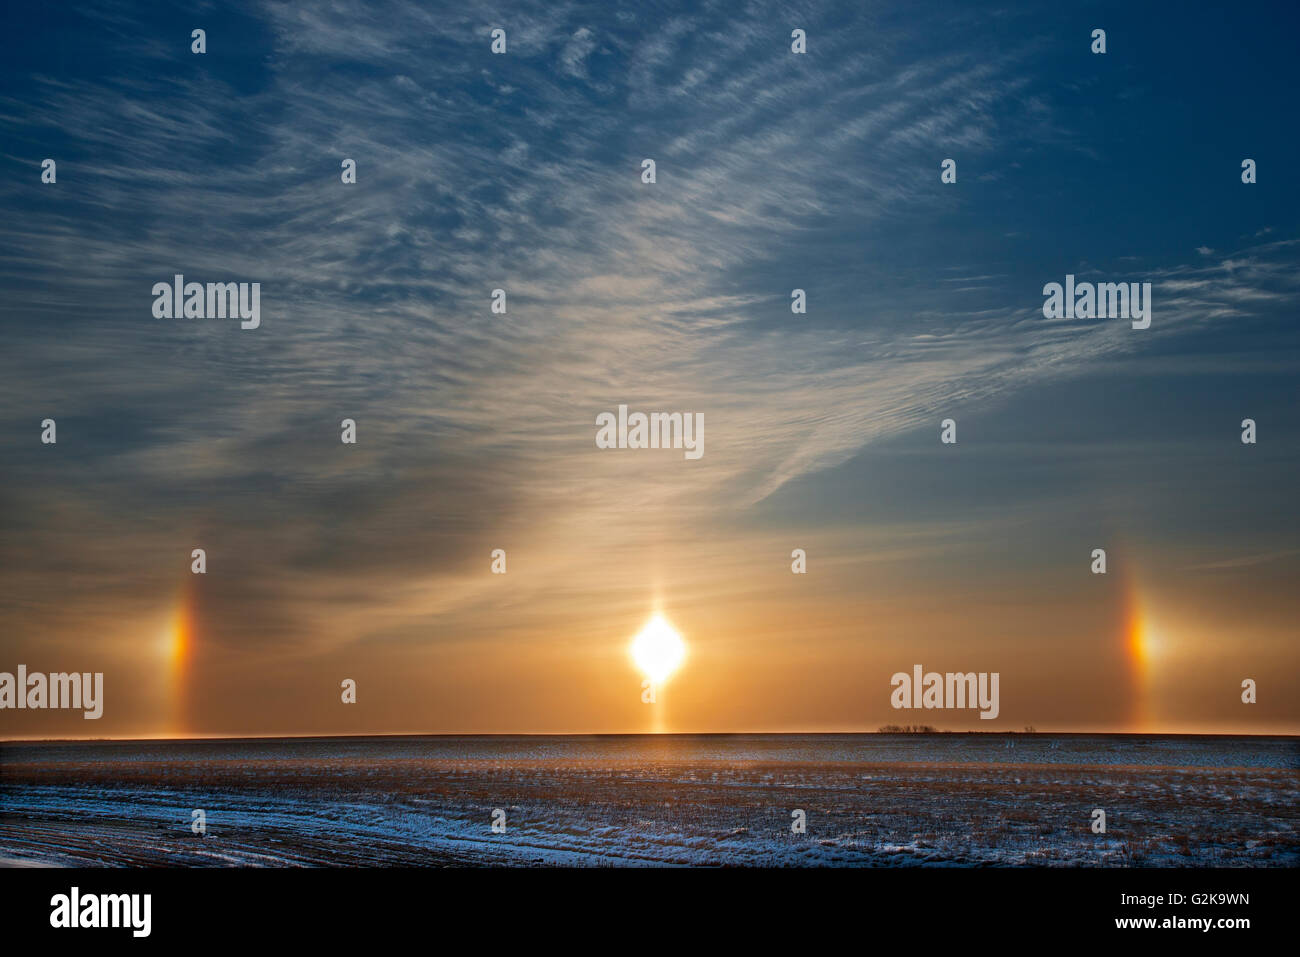 Sundogs on the Canadian prairie Winnipeg Manitoba Canada - Stock Image